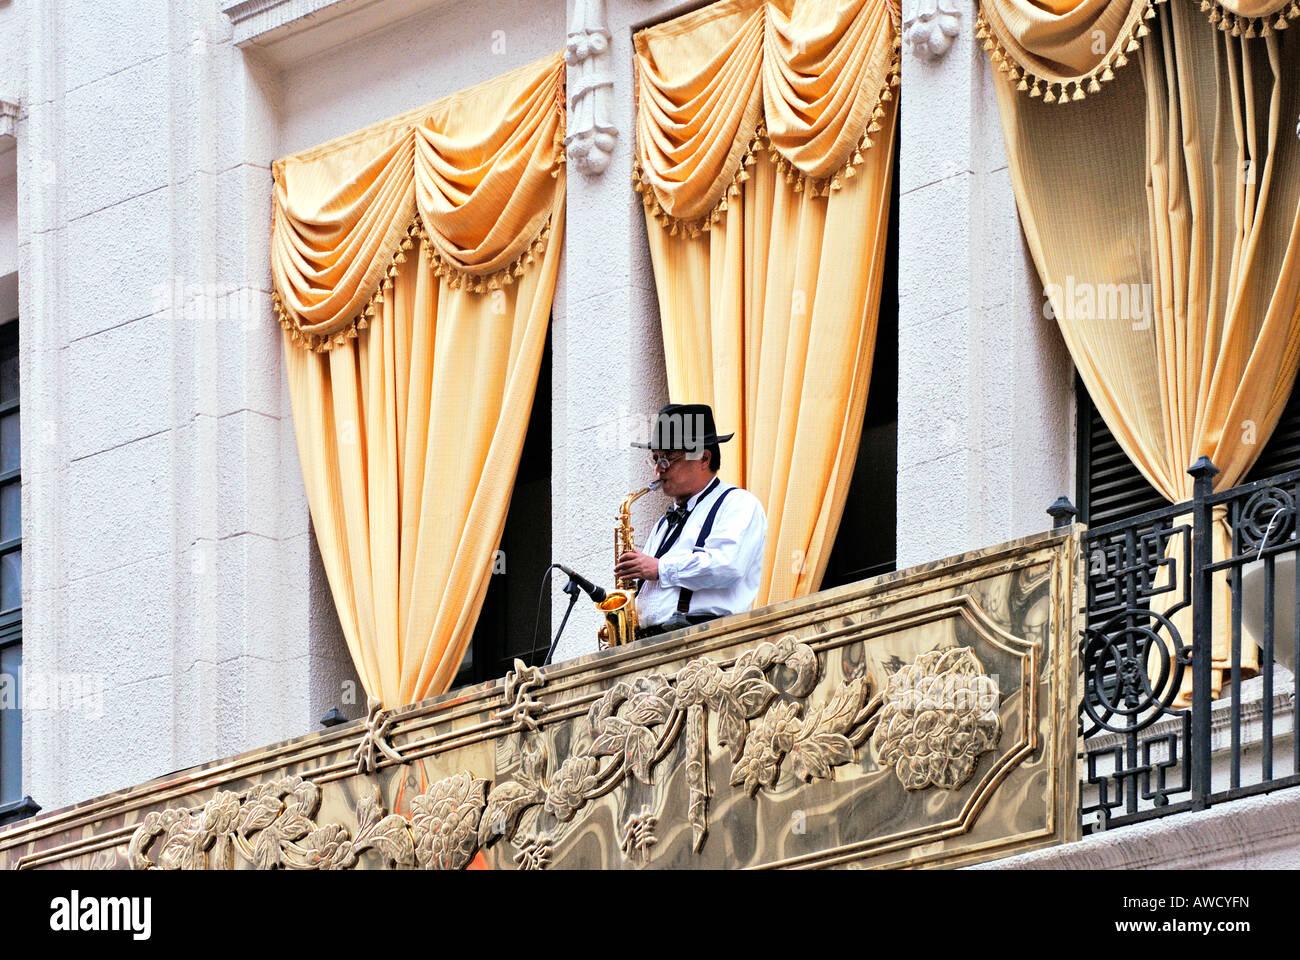 Man playing saxophone on a balkony, high street (Nanjing Donglu), Shanghai, China, Asia - Stock Image